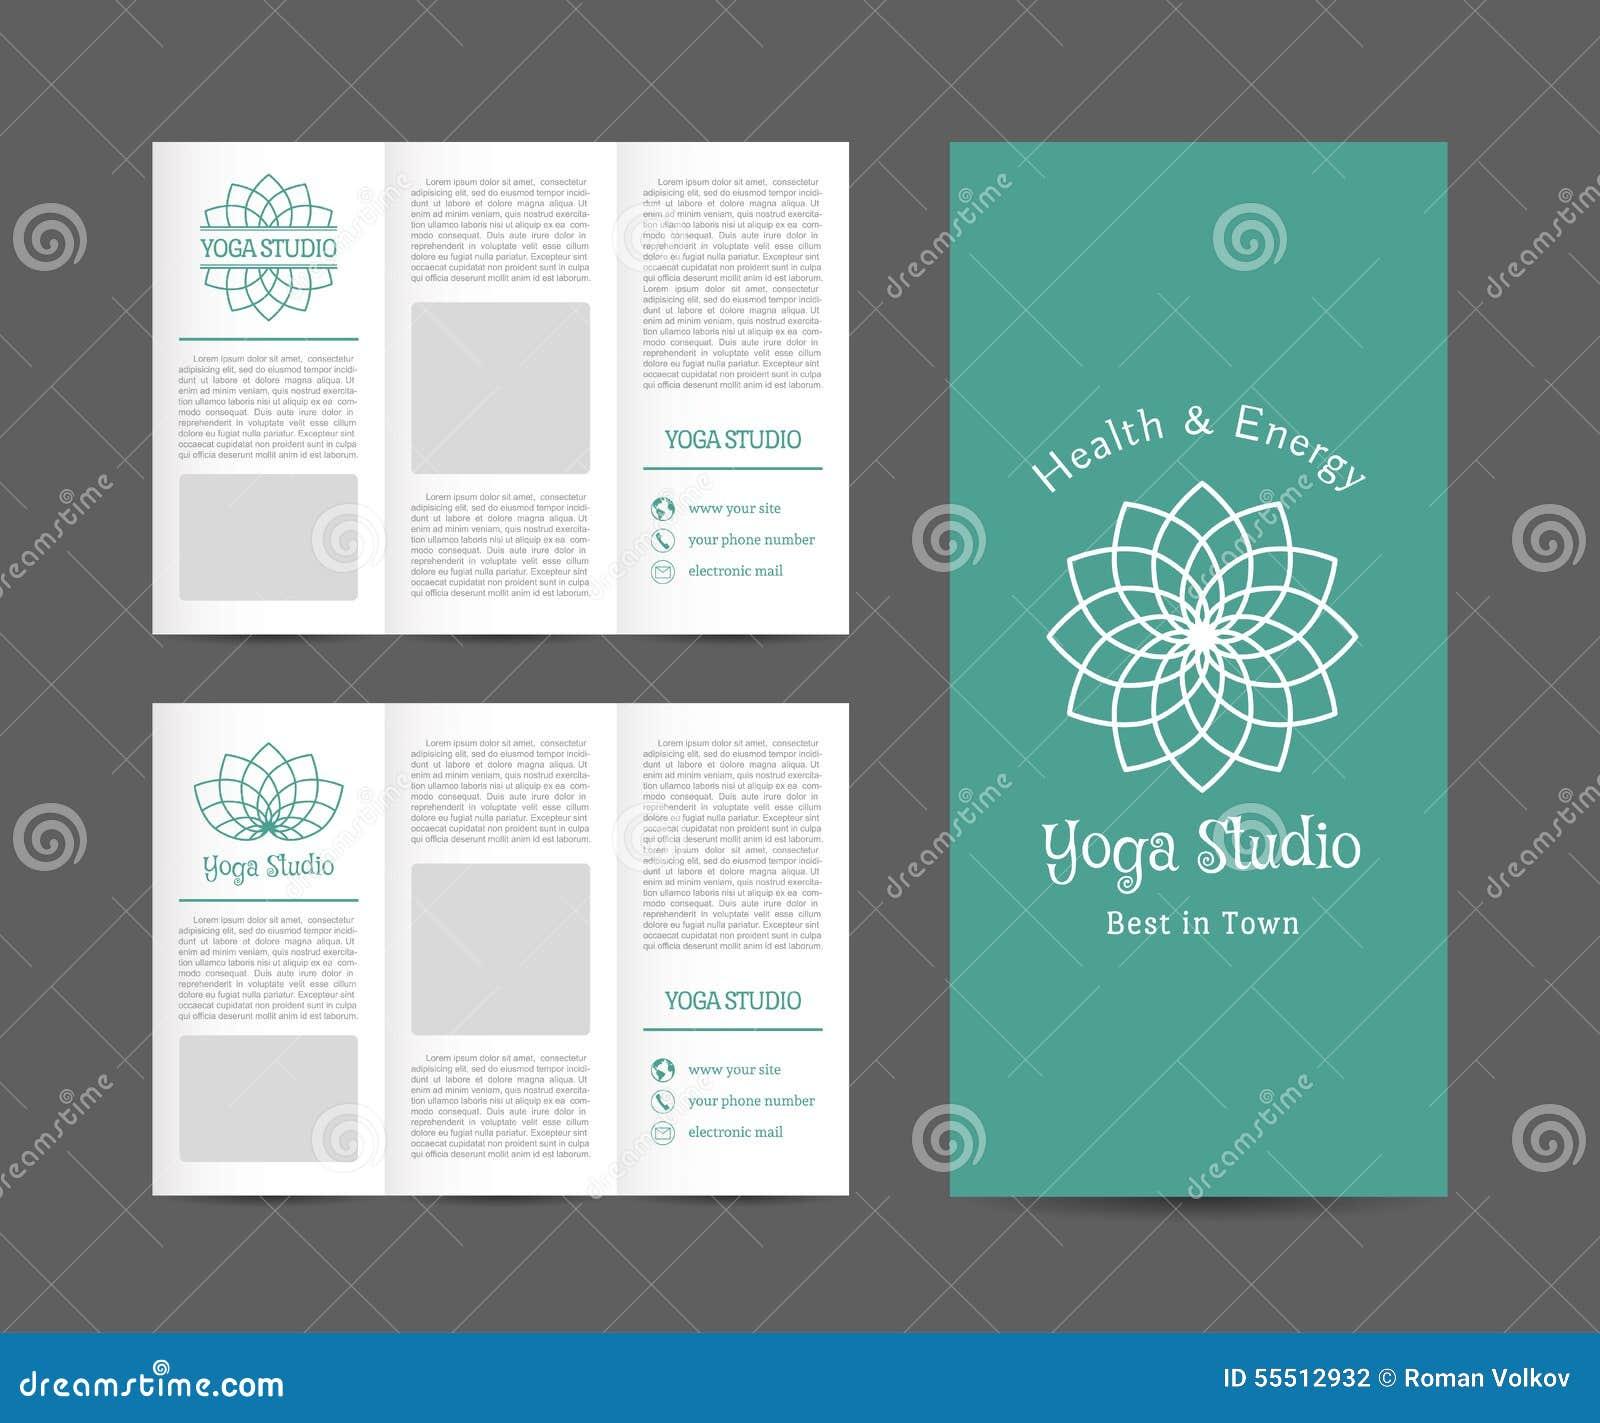 Yoga Studio Vector Brochure Template Stock Vector Illustration Of